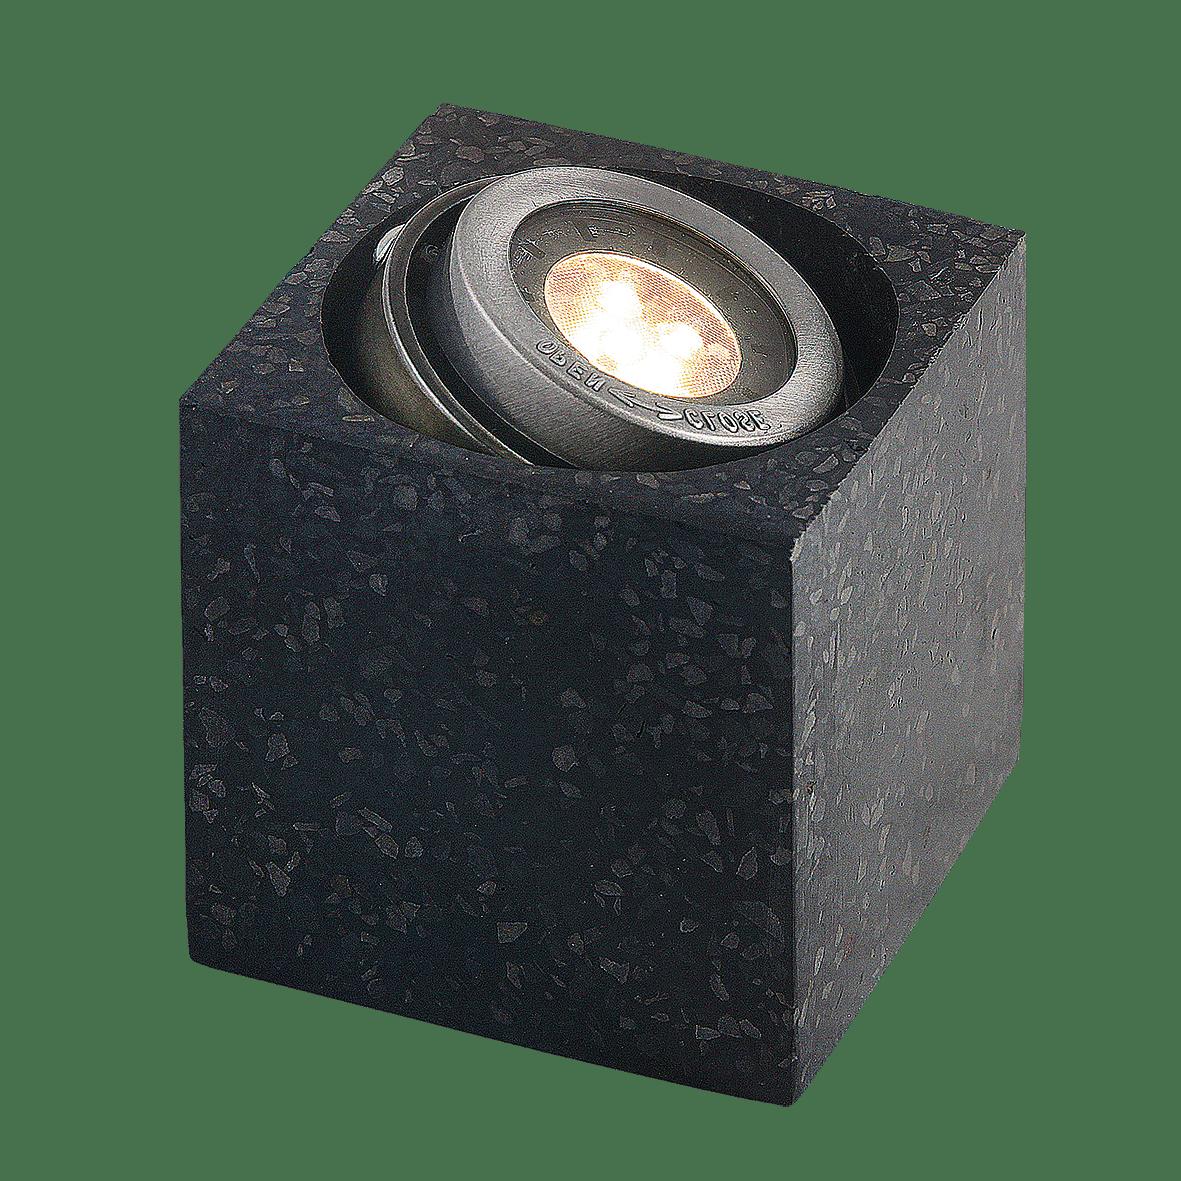 Garden Lights Tuinverlichting Cylon 12V LED   Stijlvolle Tuinlamp